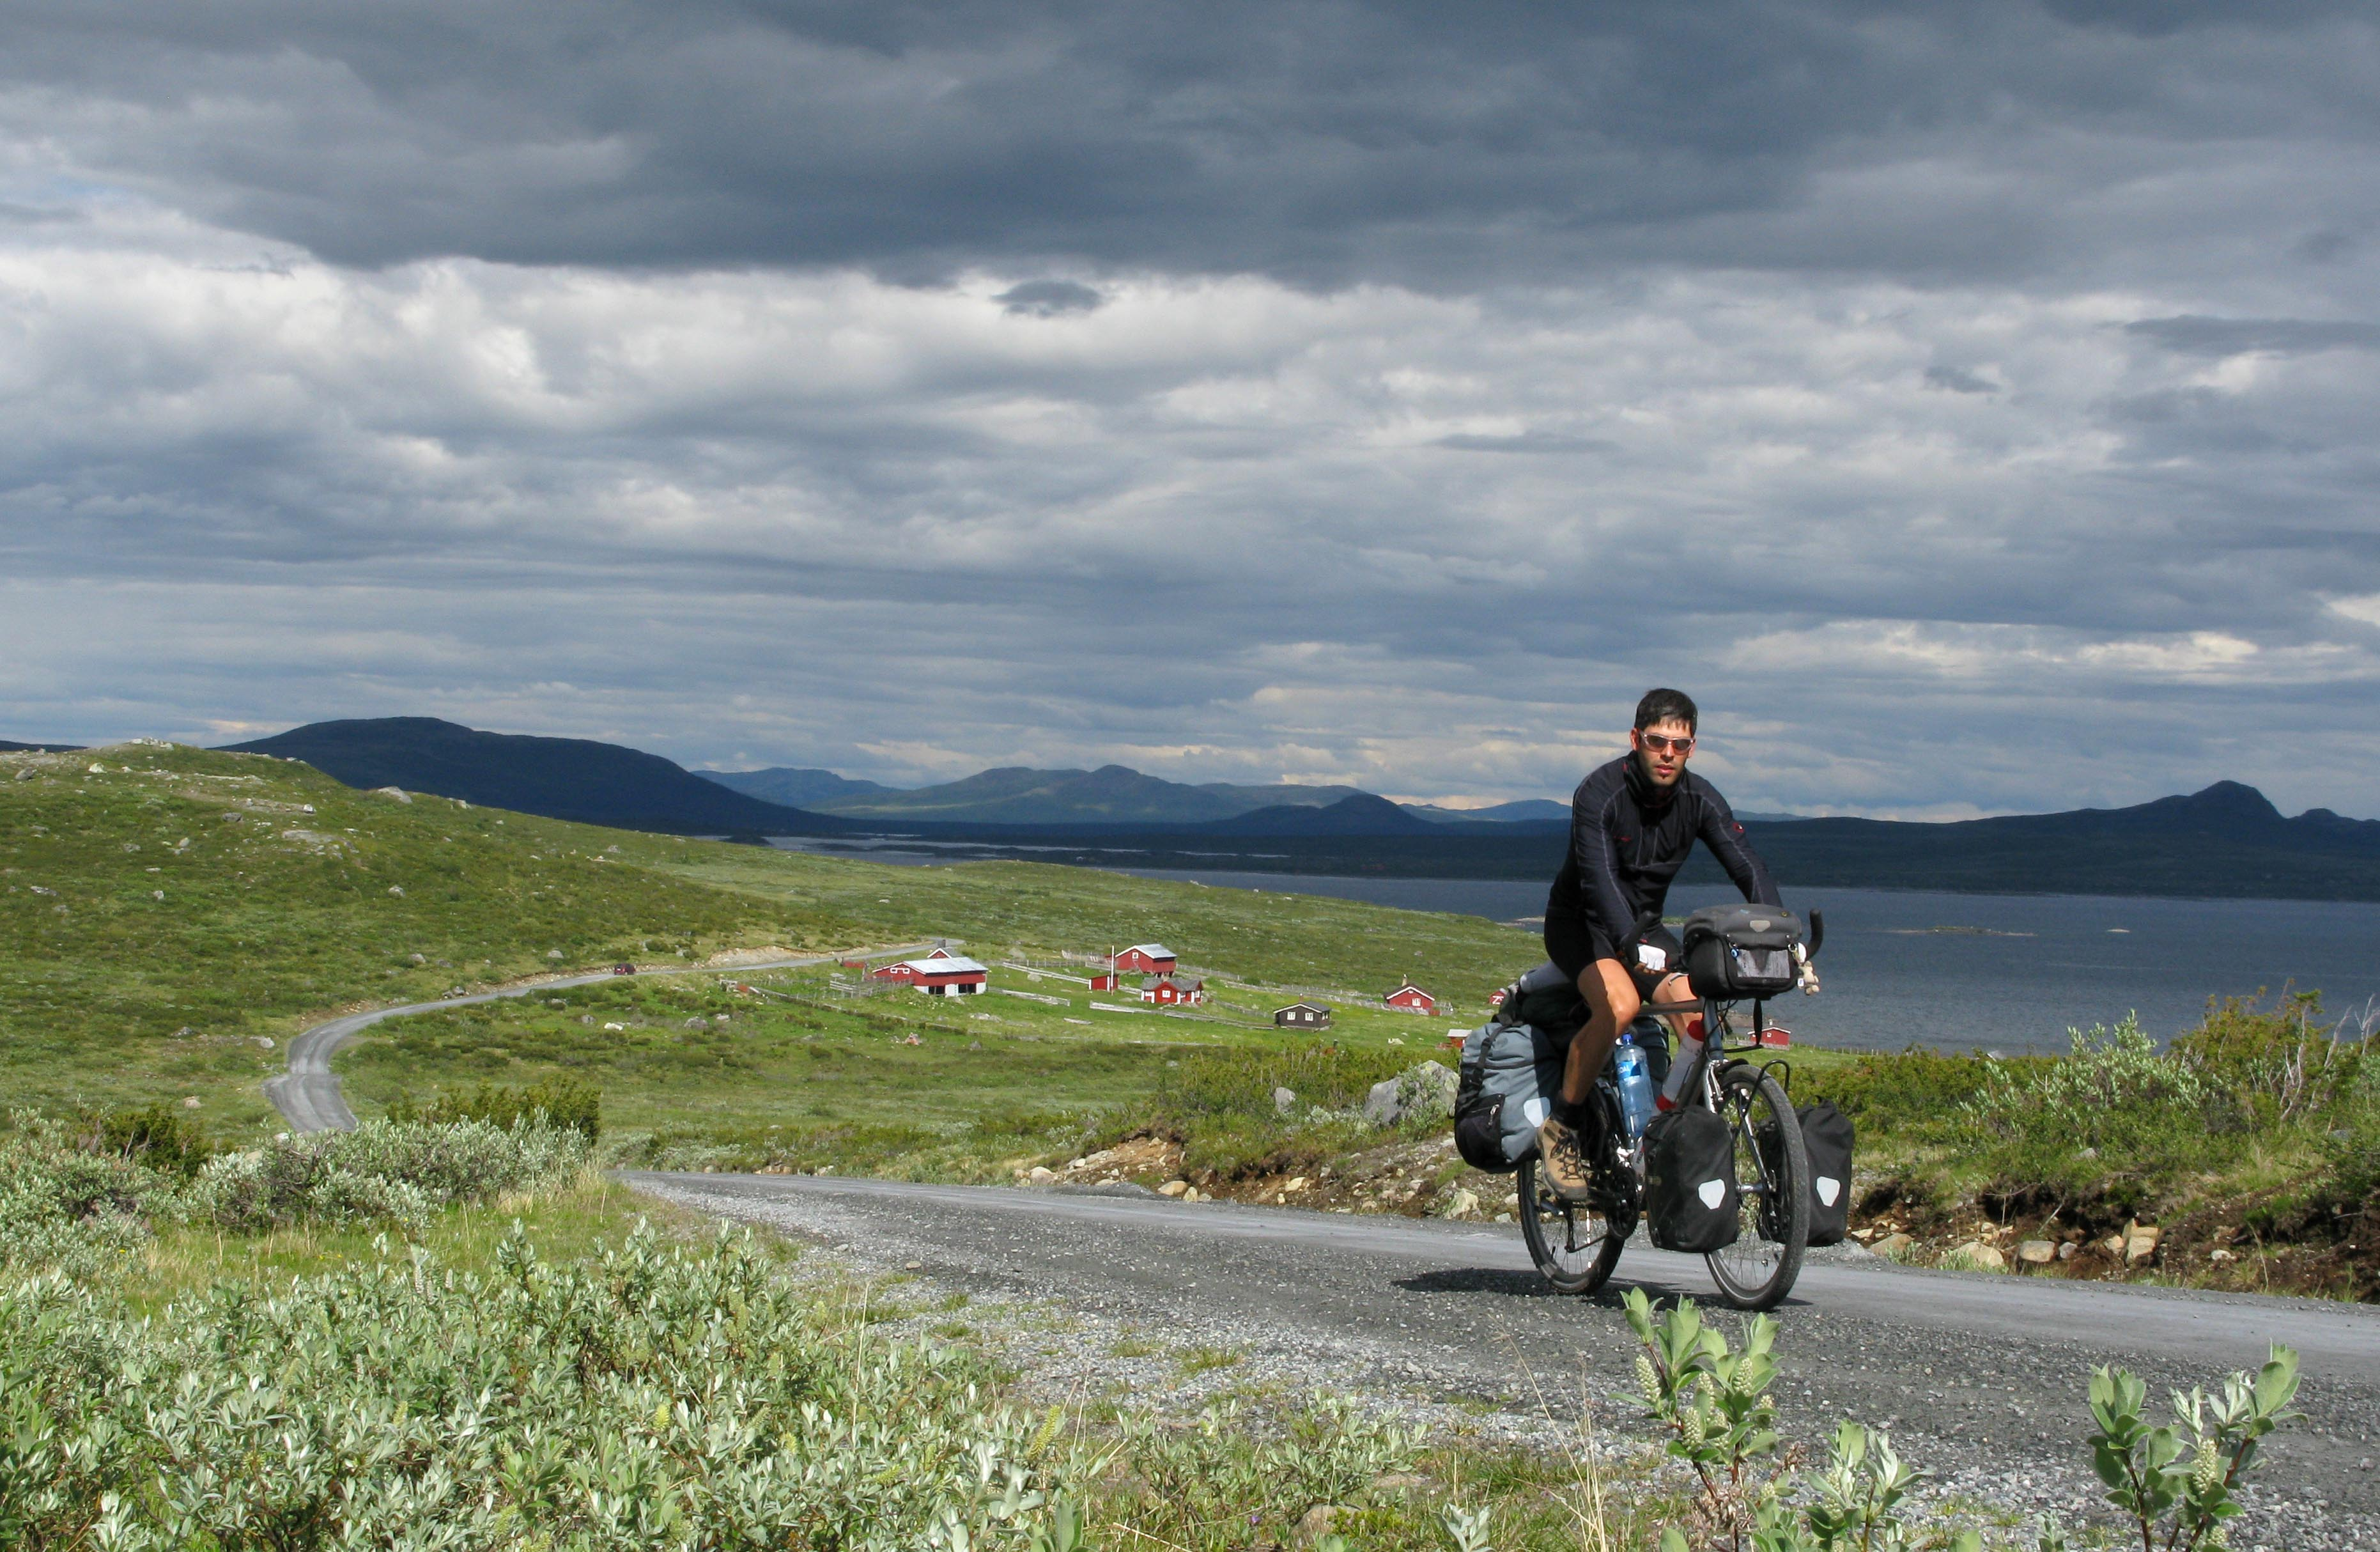 norwegen-maurizio-sognefjellsvegen